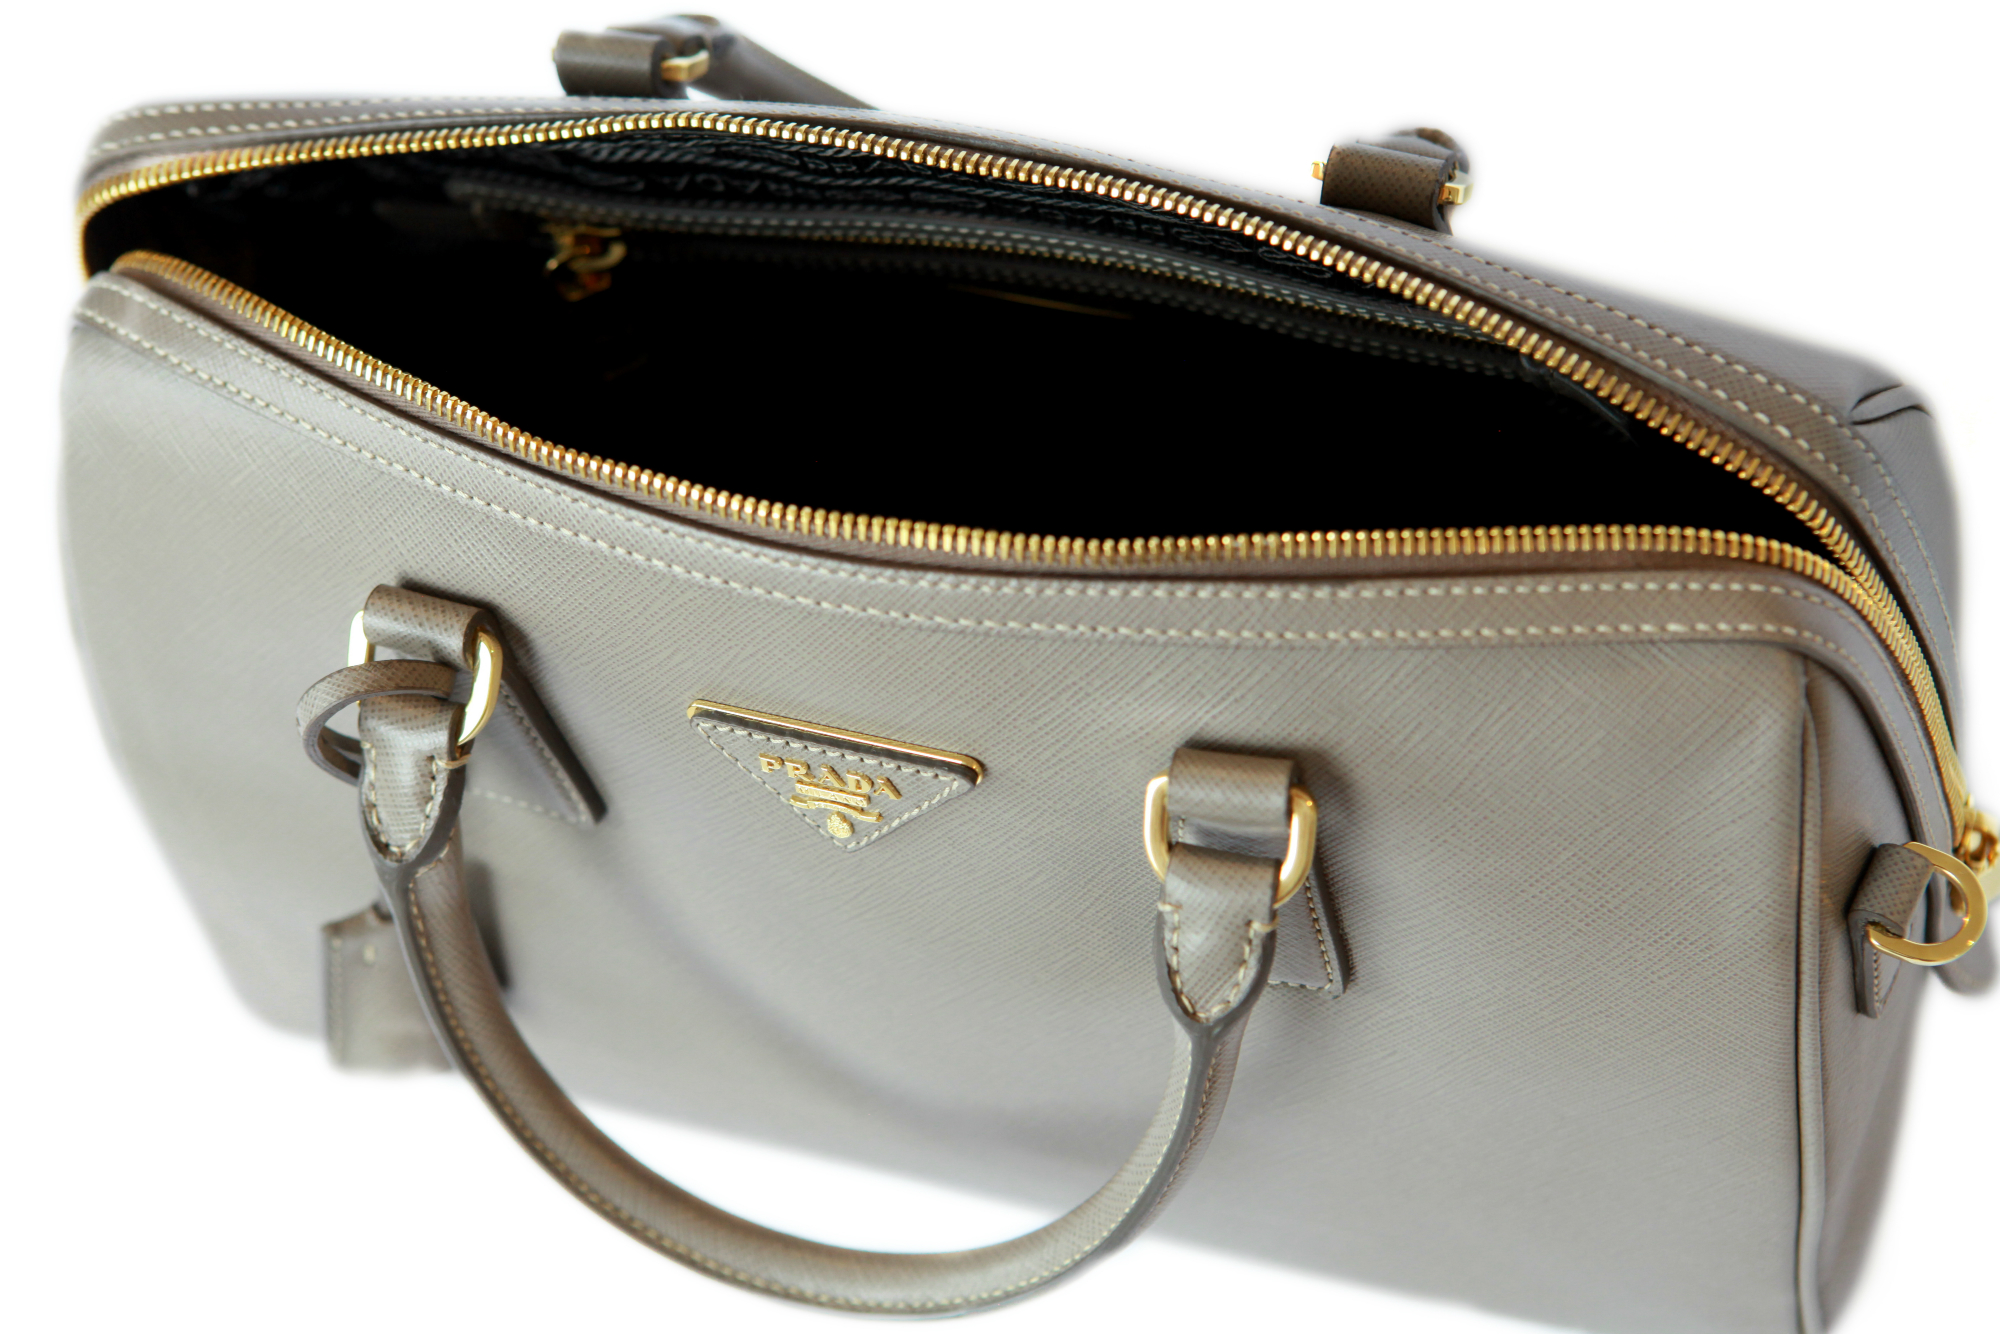 Hire a Prada Saffiano Lux Bauletto Bag from Elite Couture